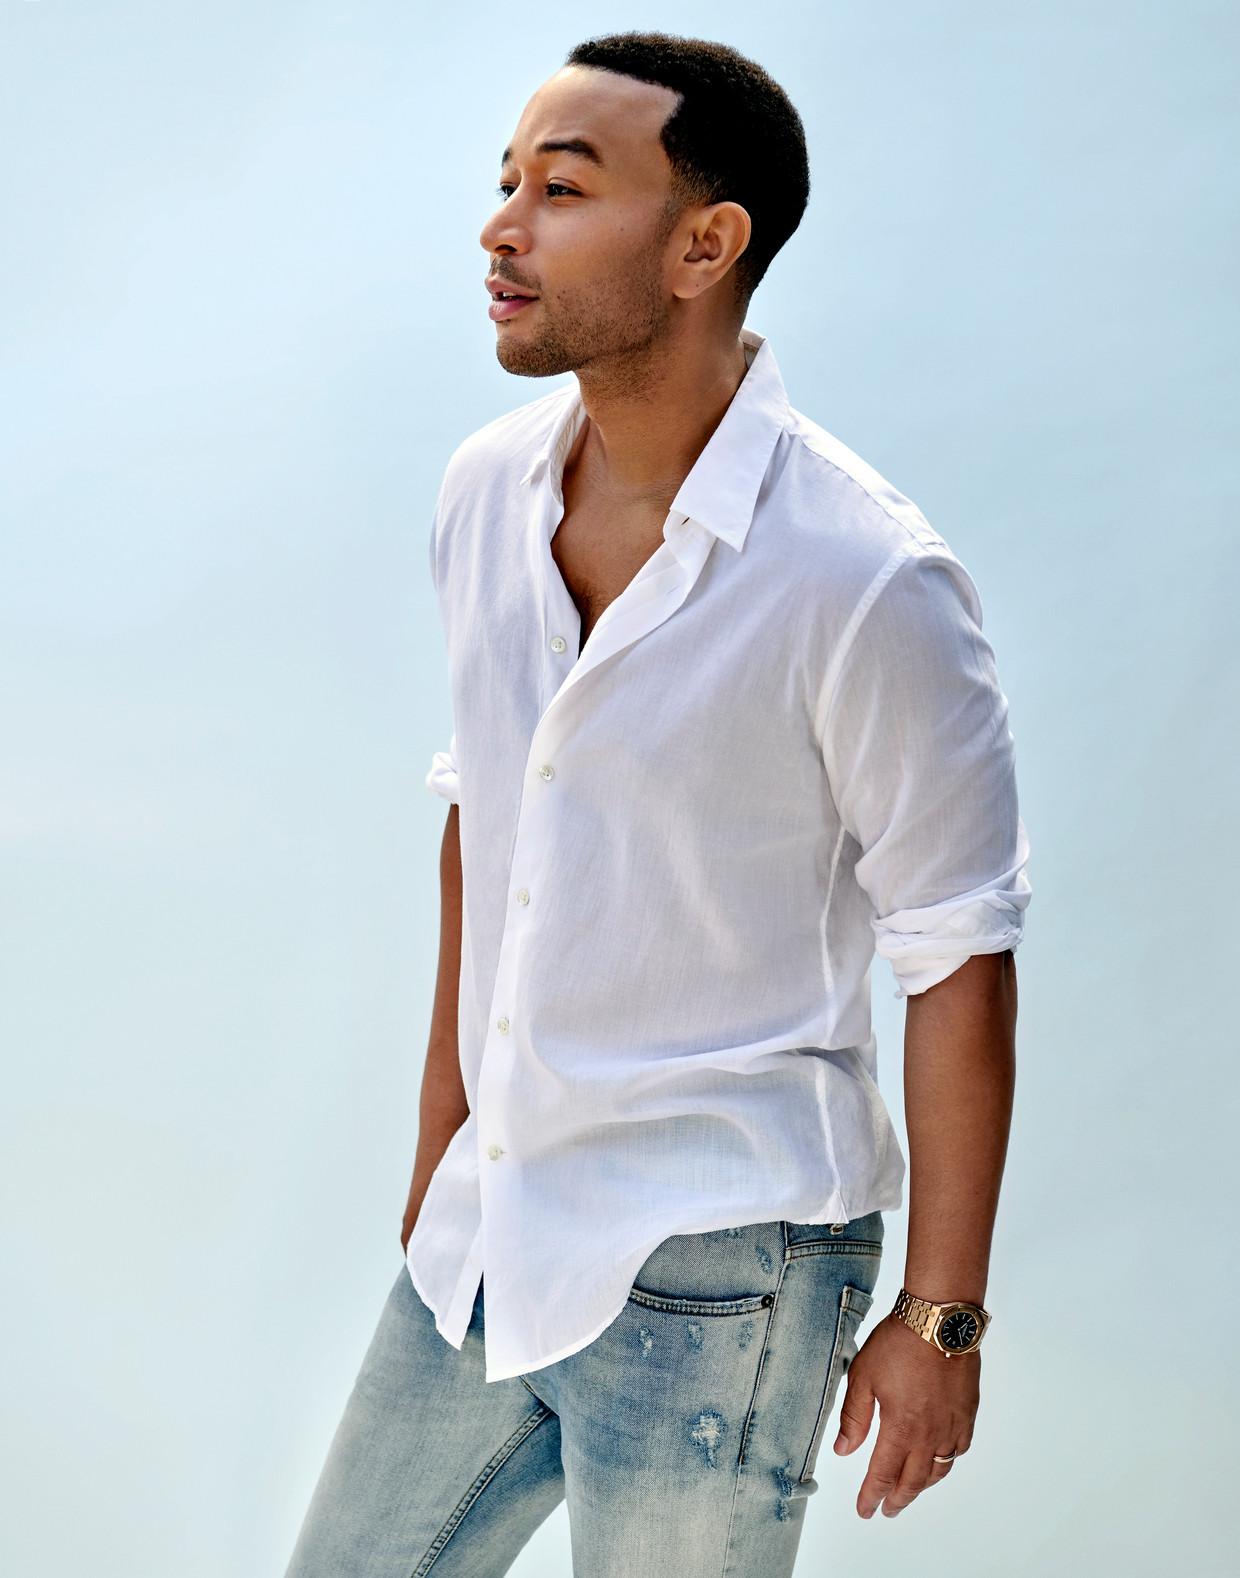 John Legend: 'Ik was zo'n jongetje dat al heel snel dingen als Für Elise kon spelen.' Beeld Sony Music